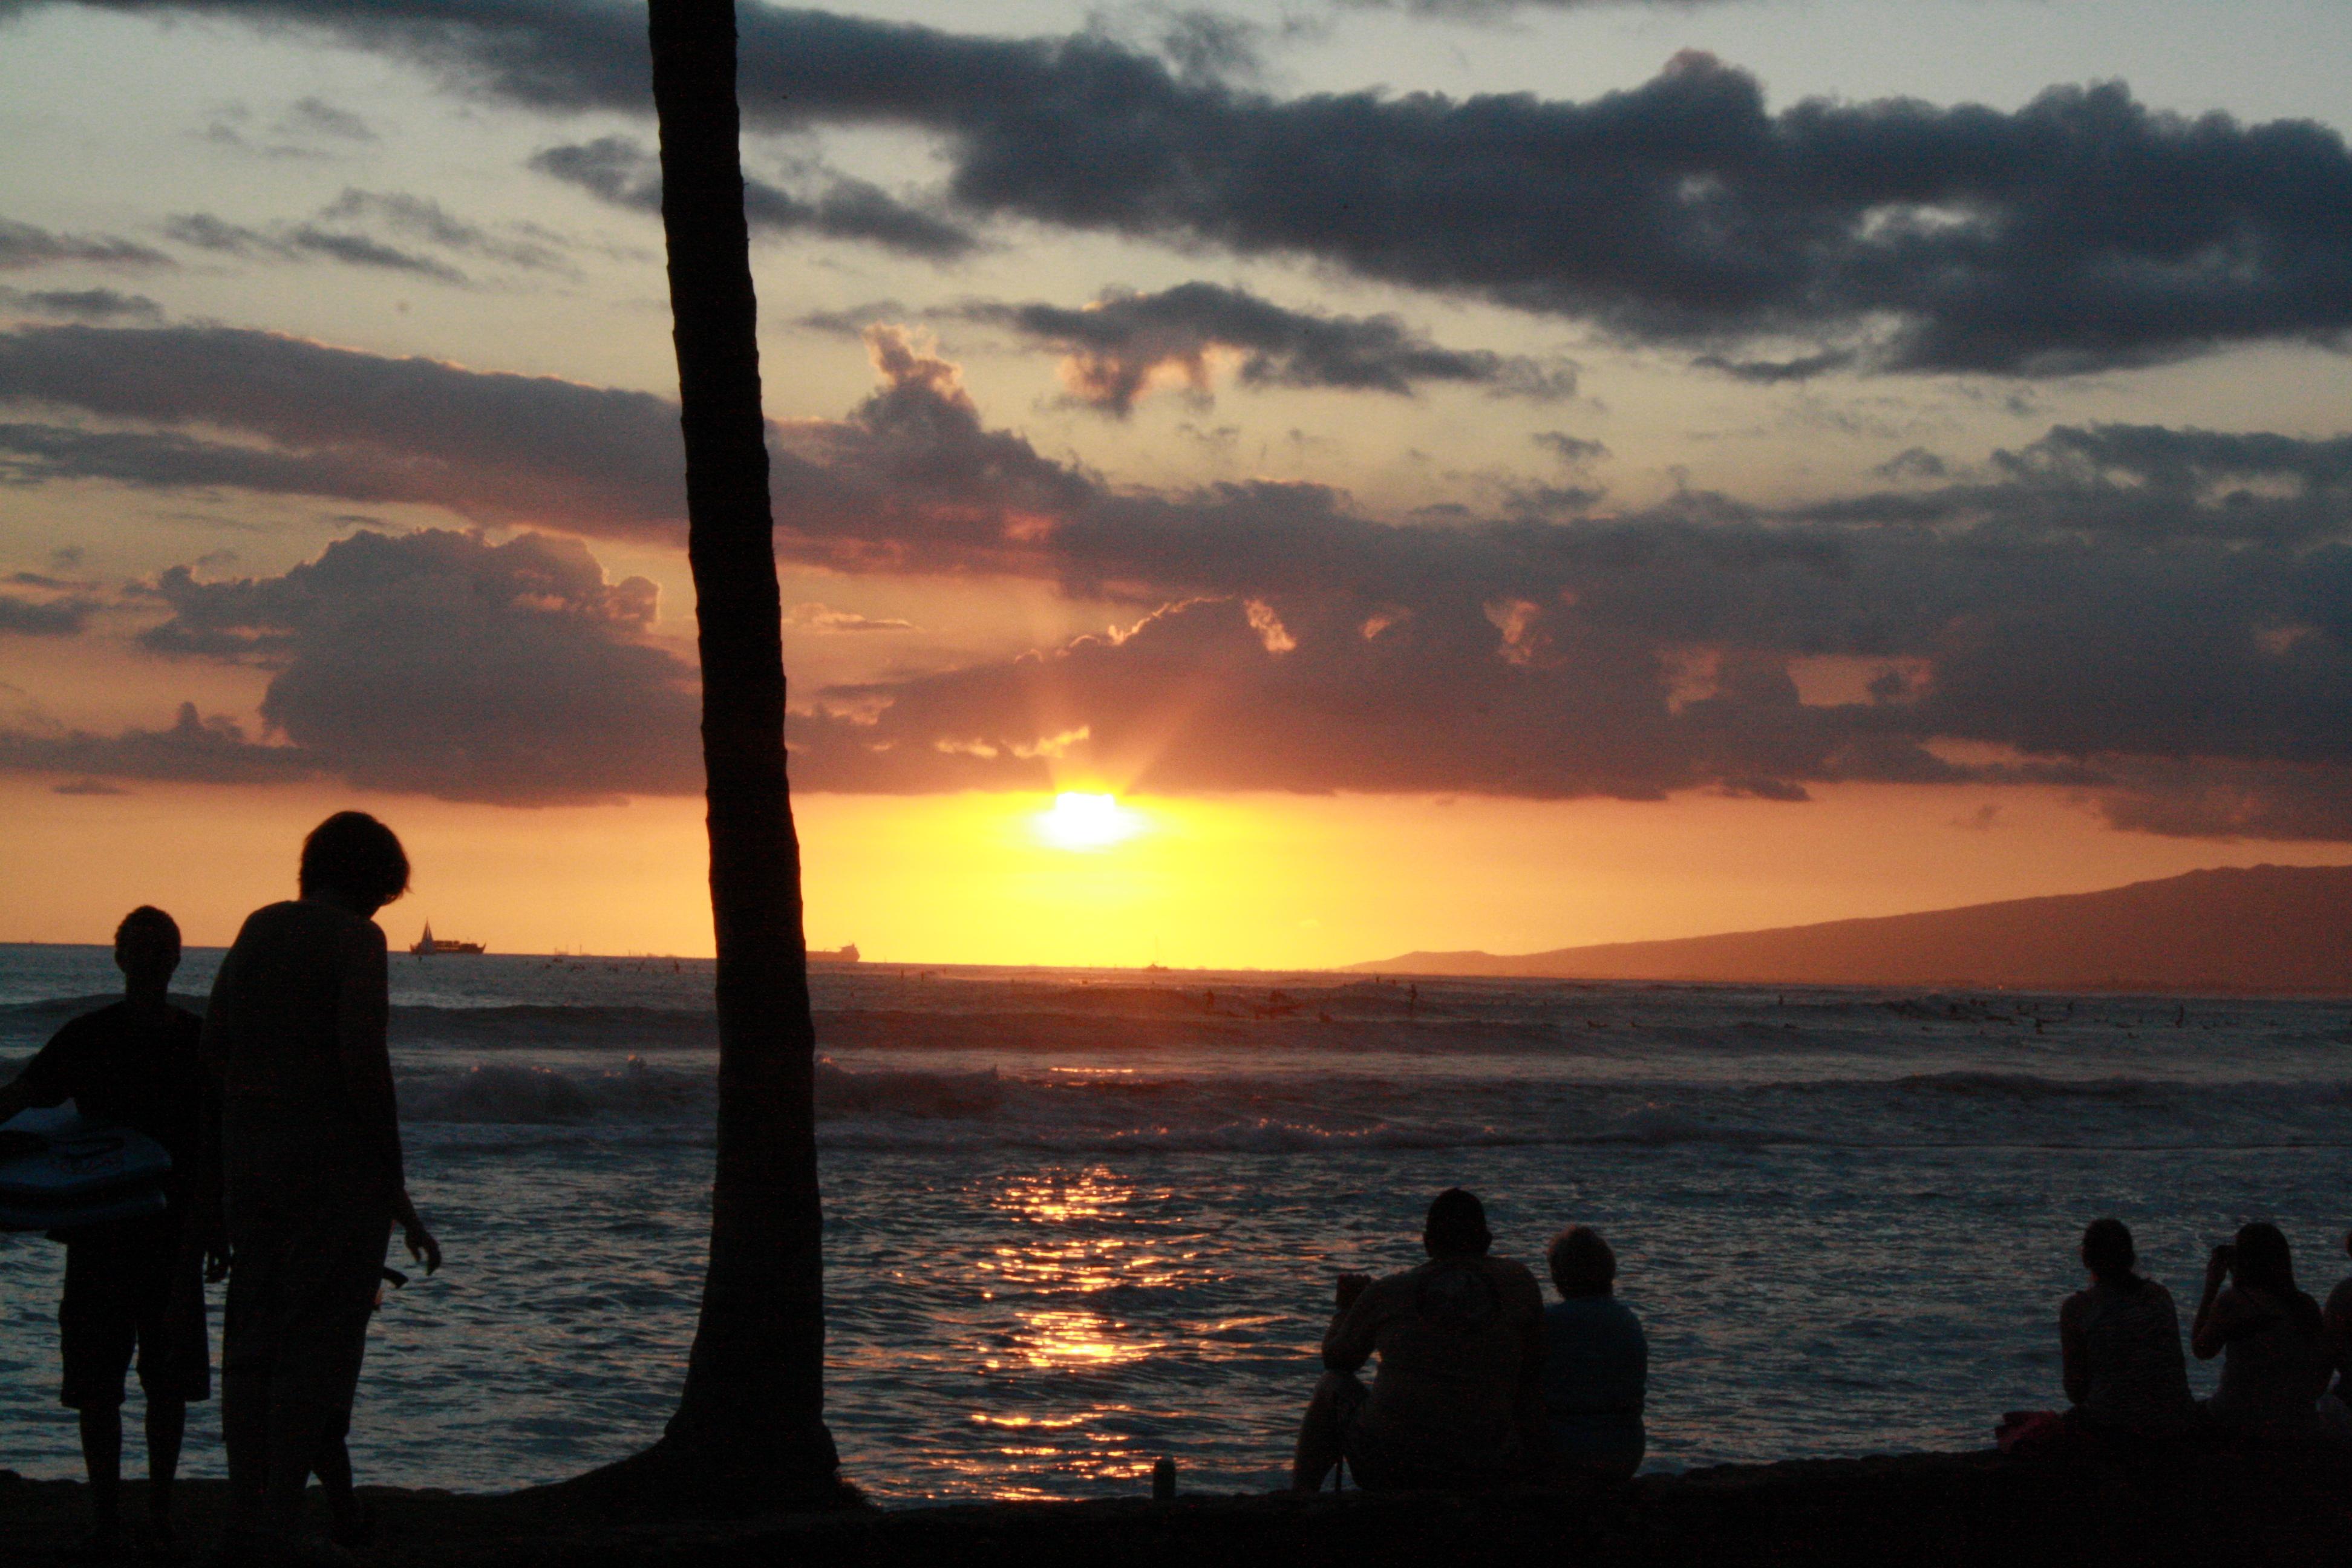 Sunset on Waikiki Beach, O'ahu for Ellen Blazer's travel blog To Travel and Bloom